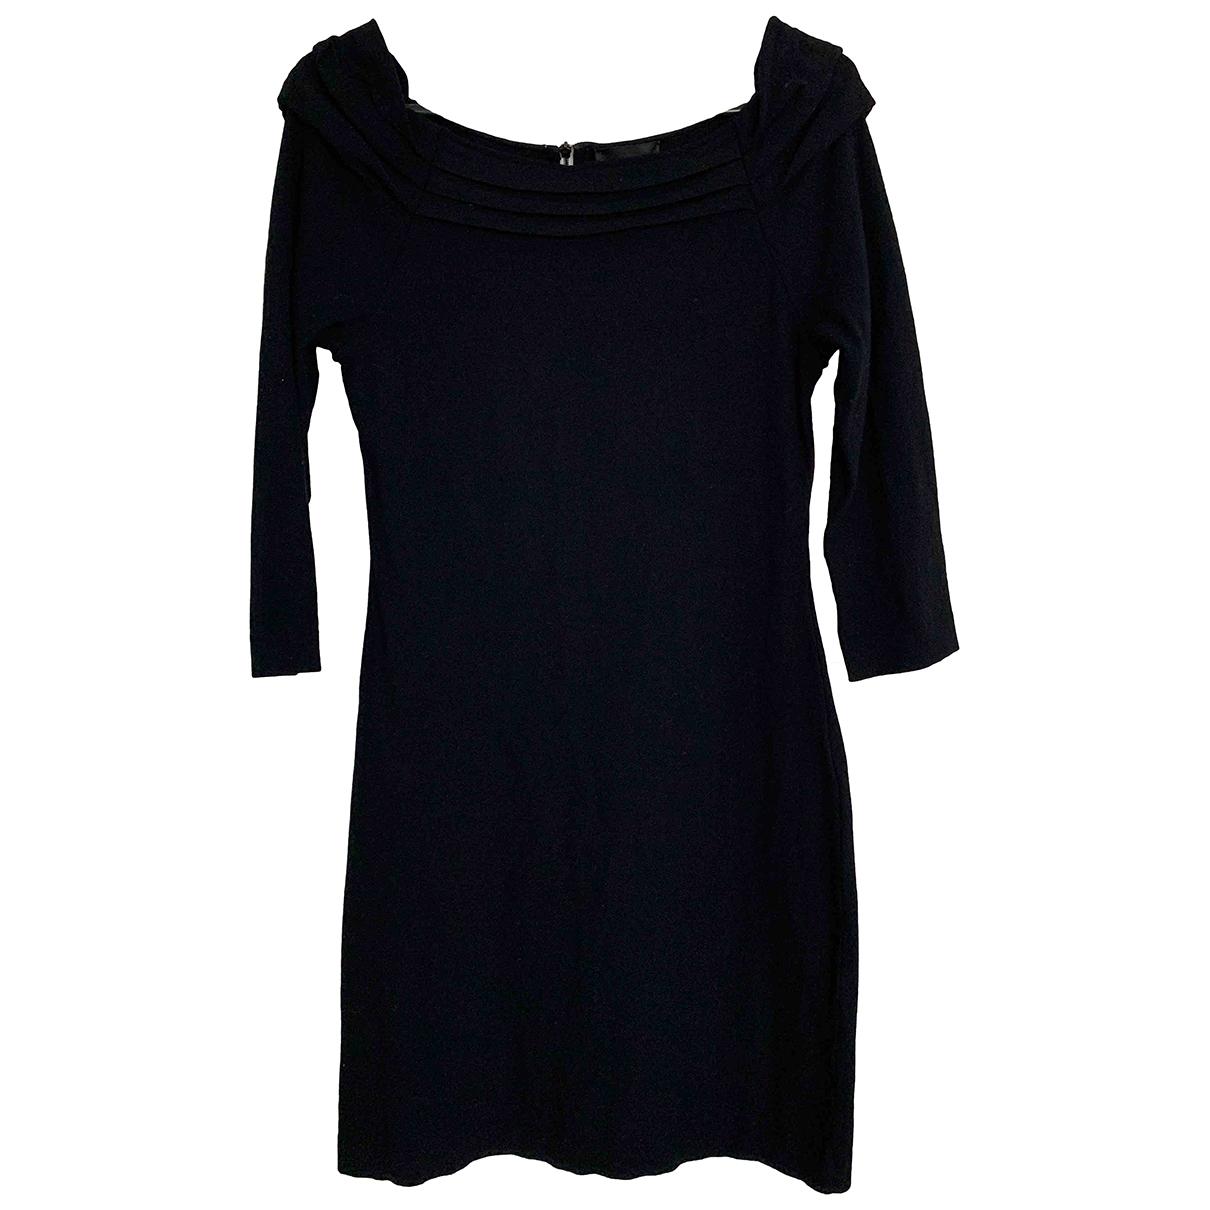 Emporio Armani - Robe   pour femme - noir